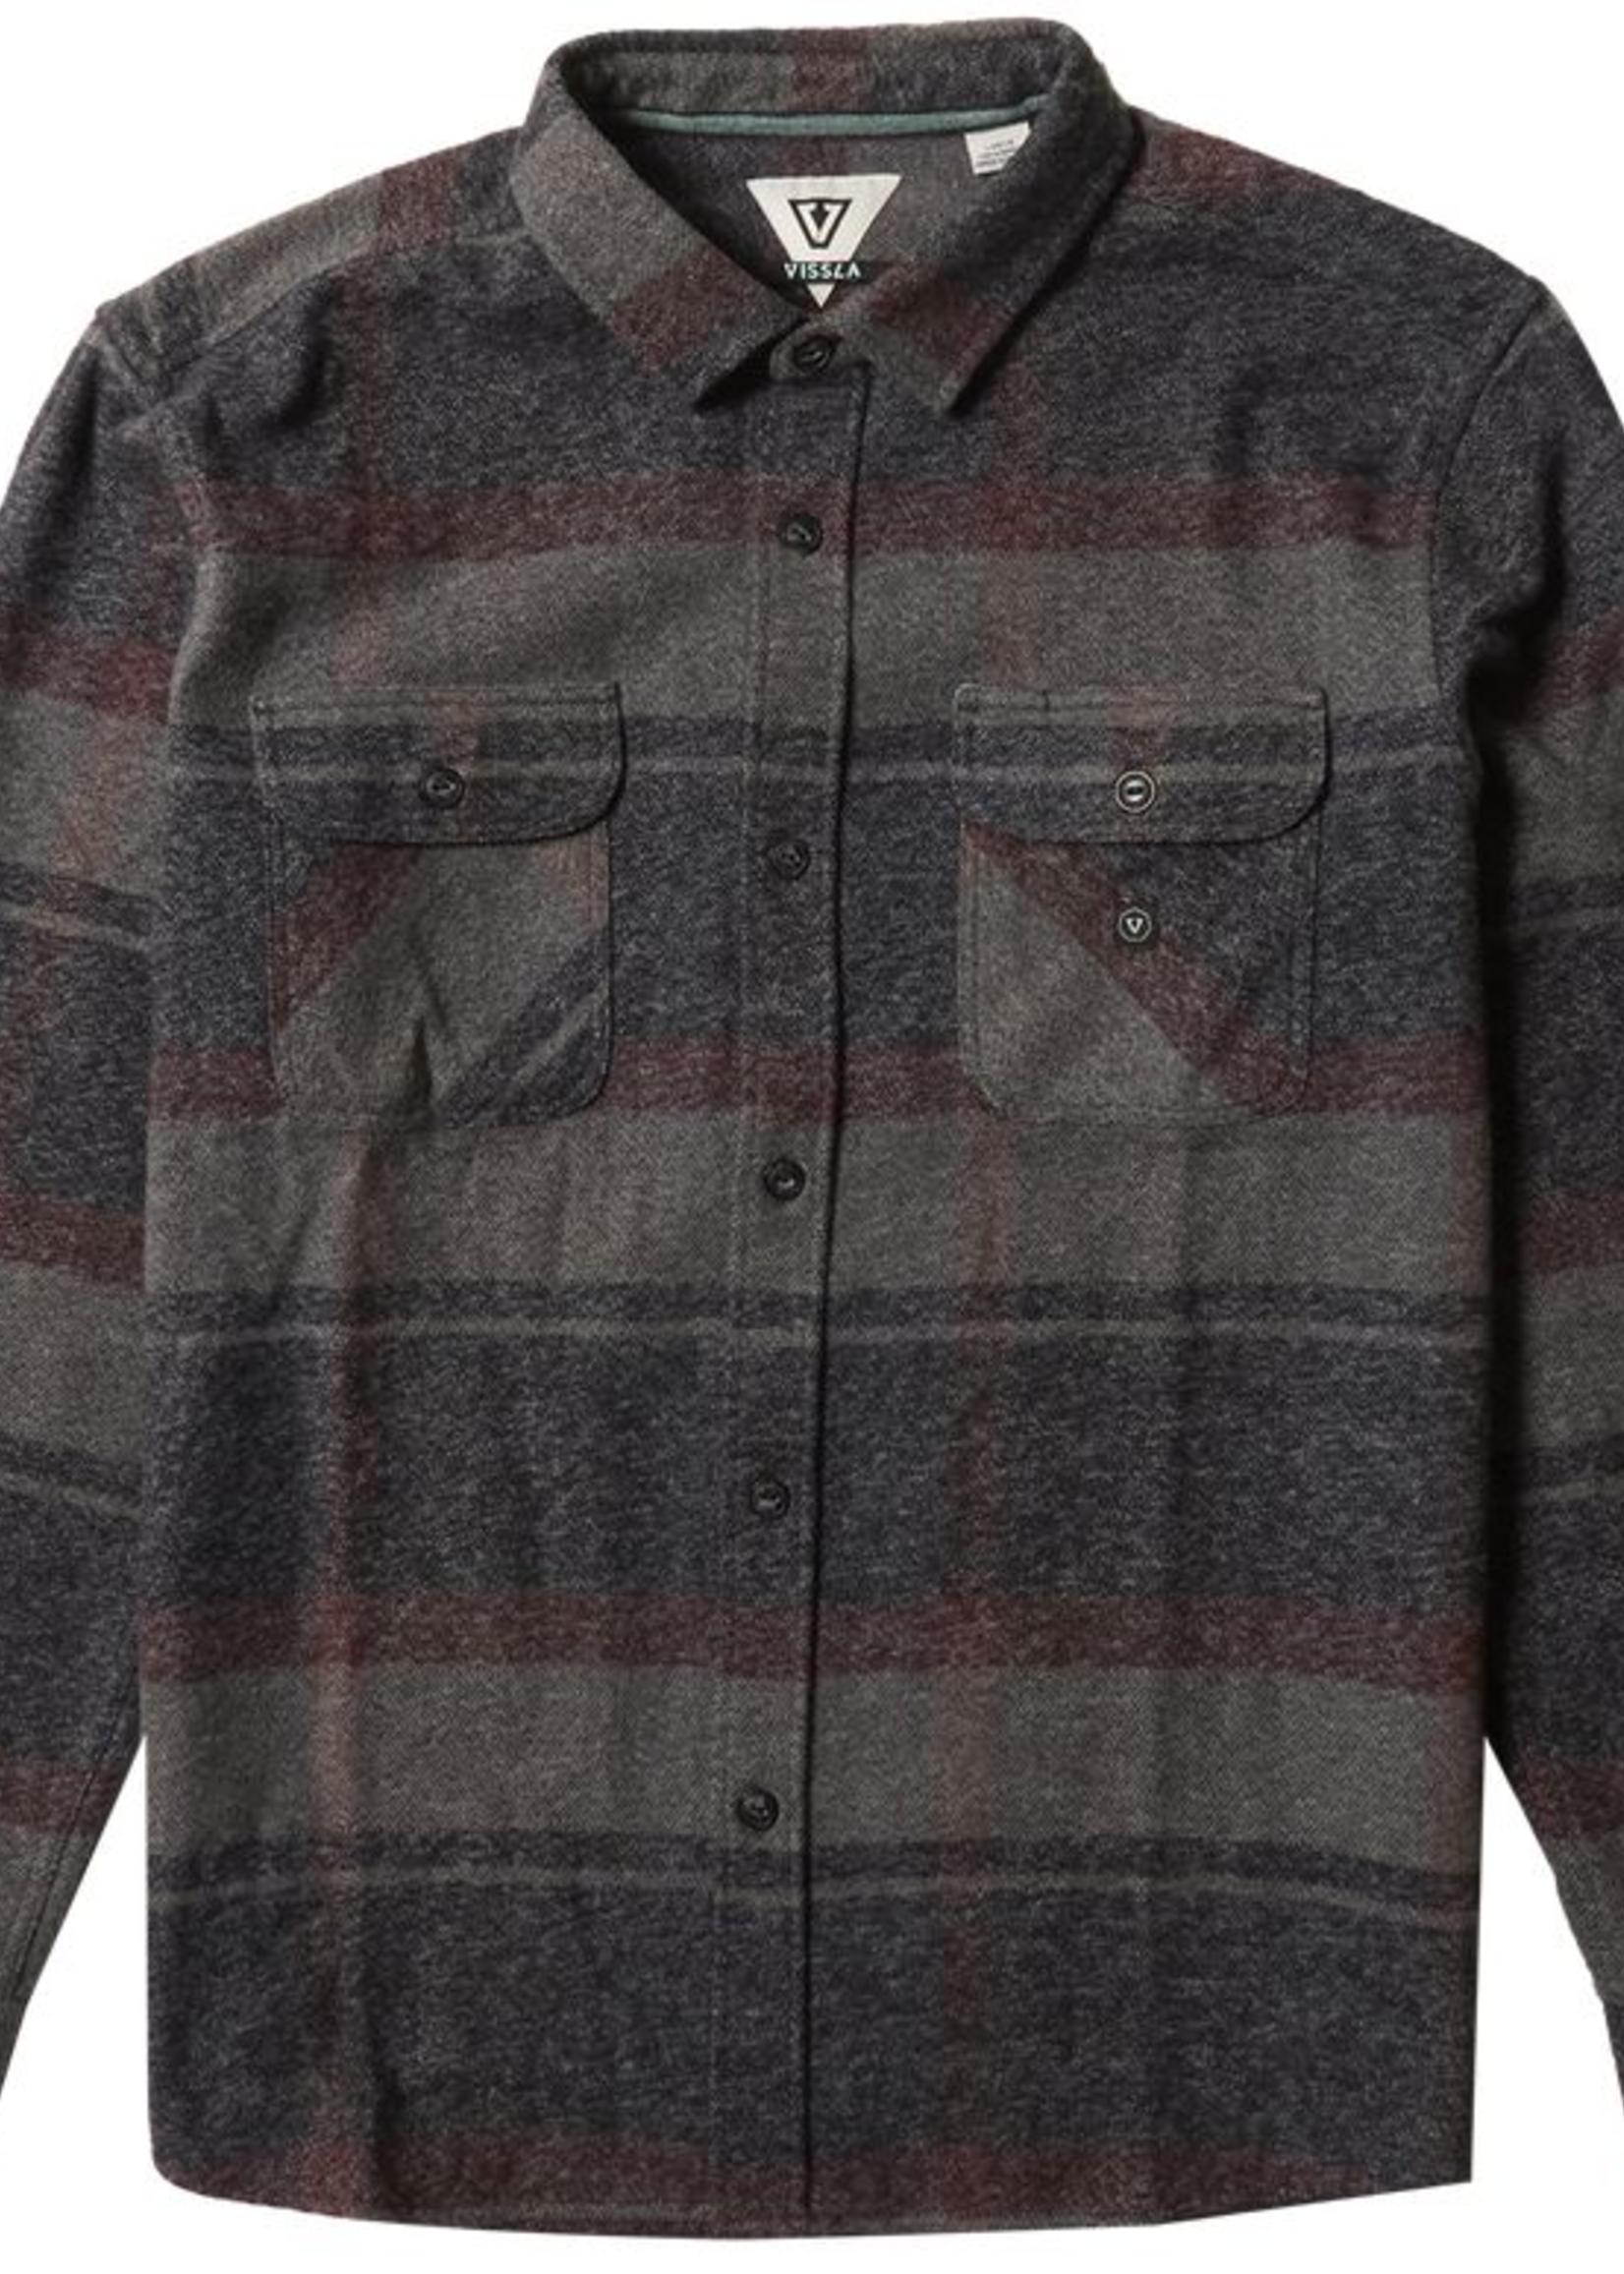 Vissla Barns L/S Flannel - Black